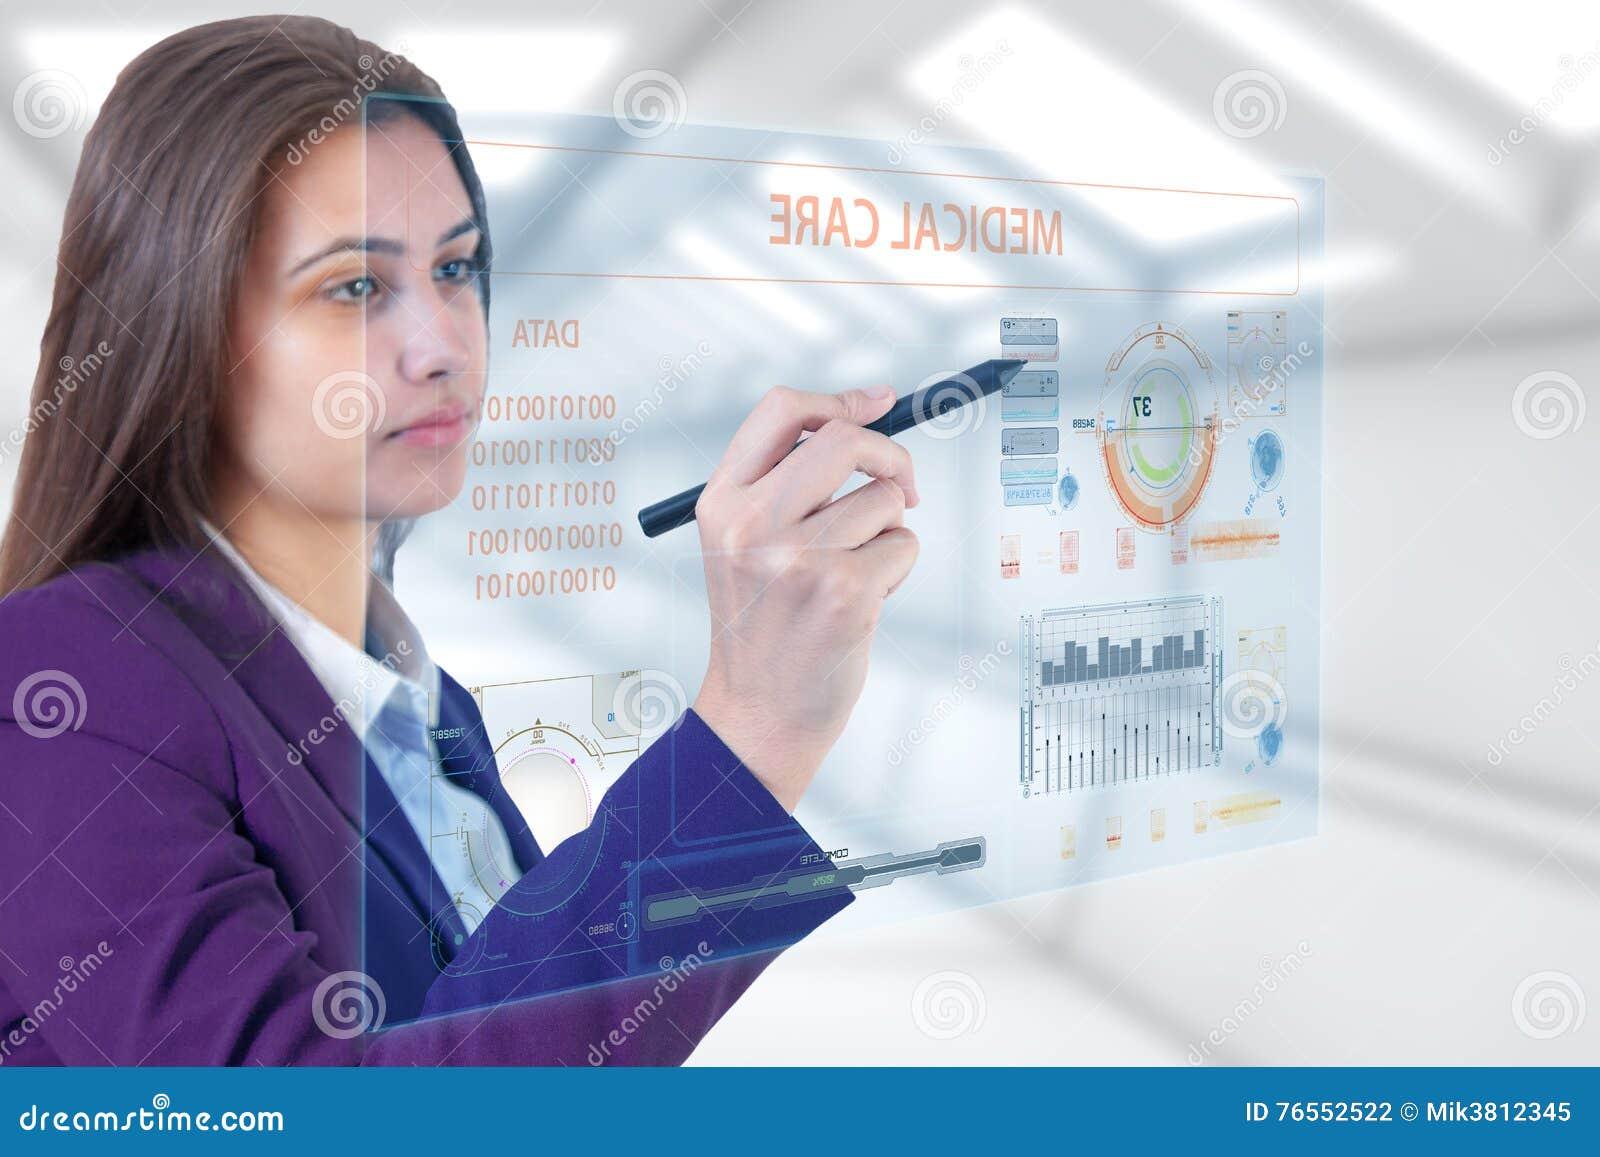 Junge Medizin Touch Screen des Brunettemädchens